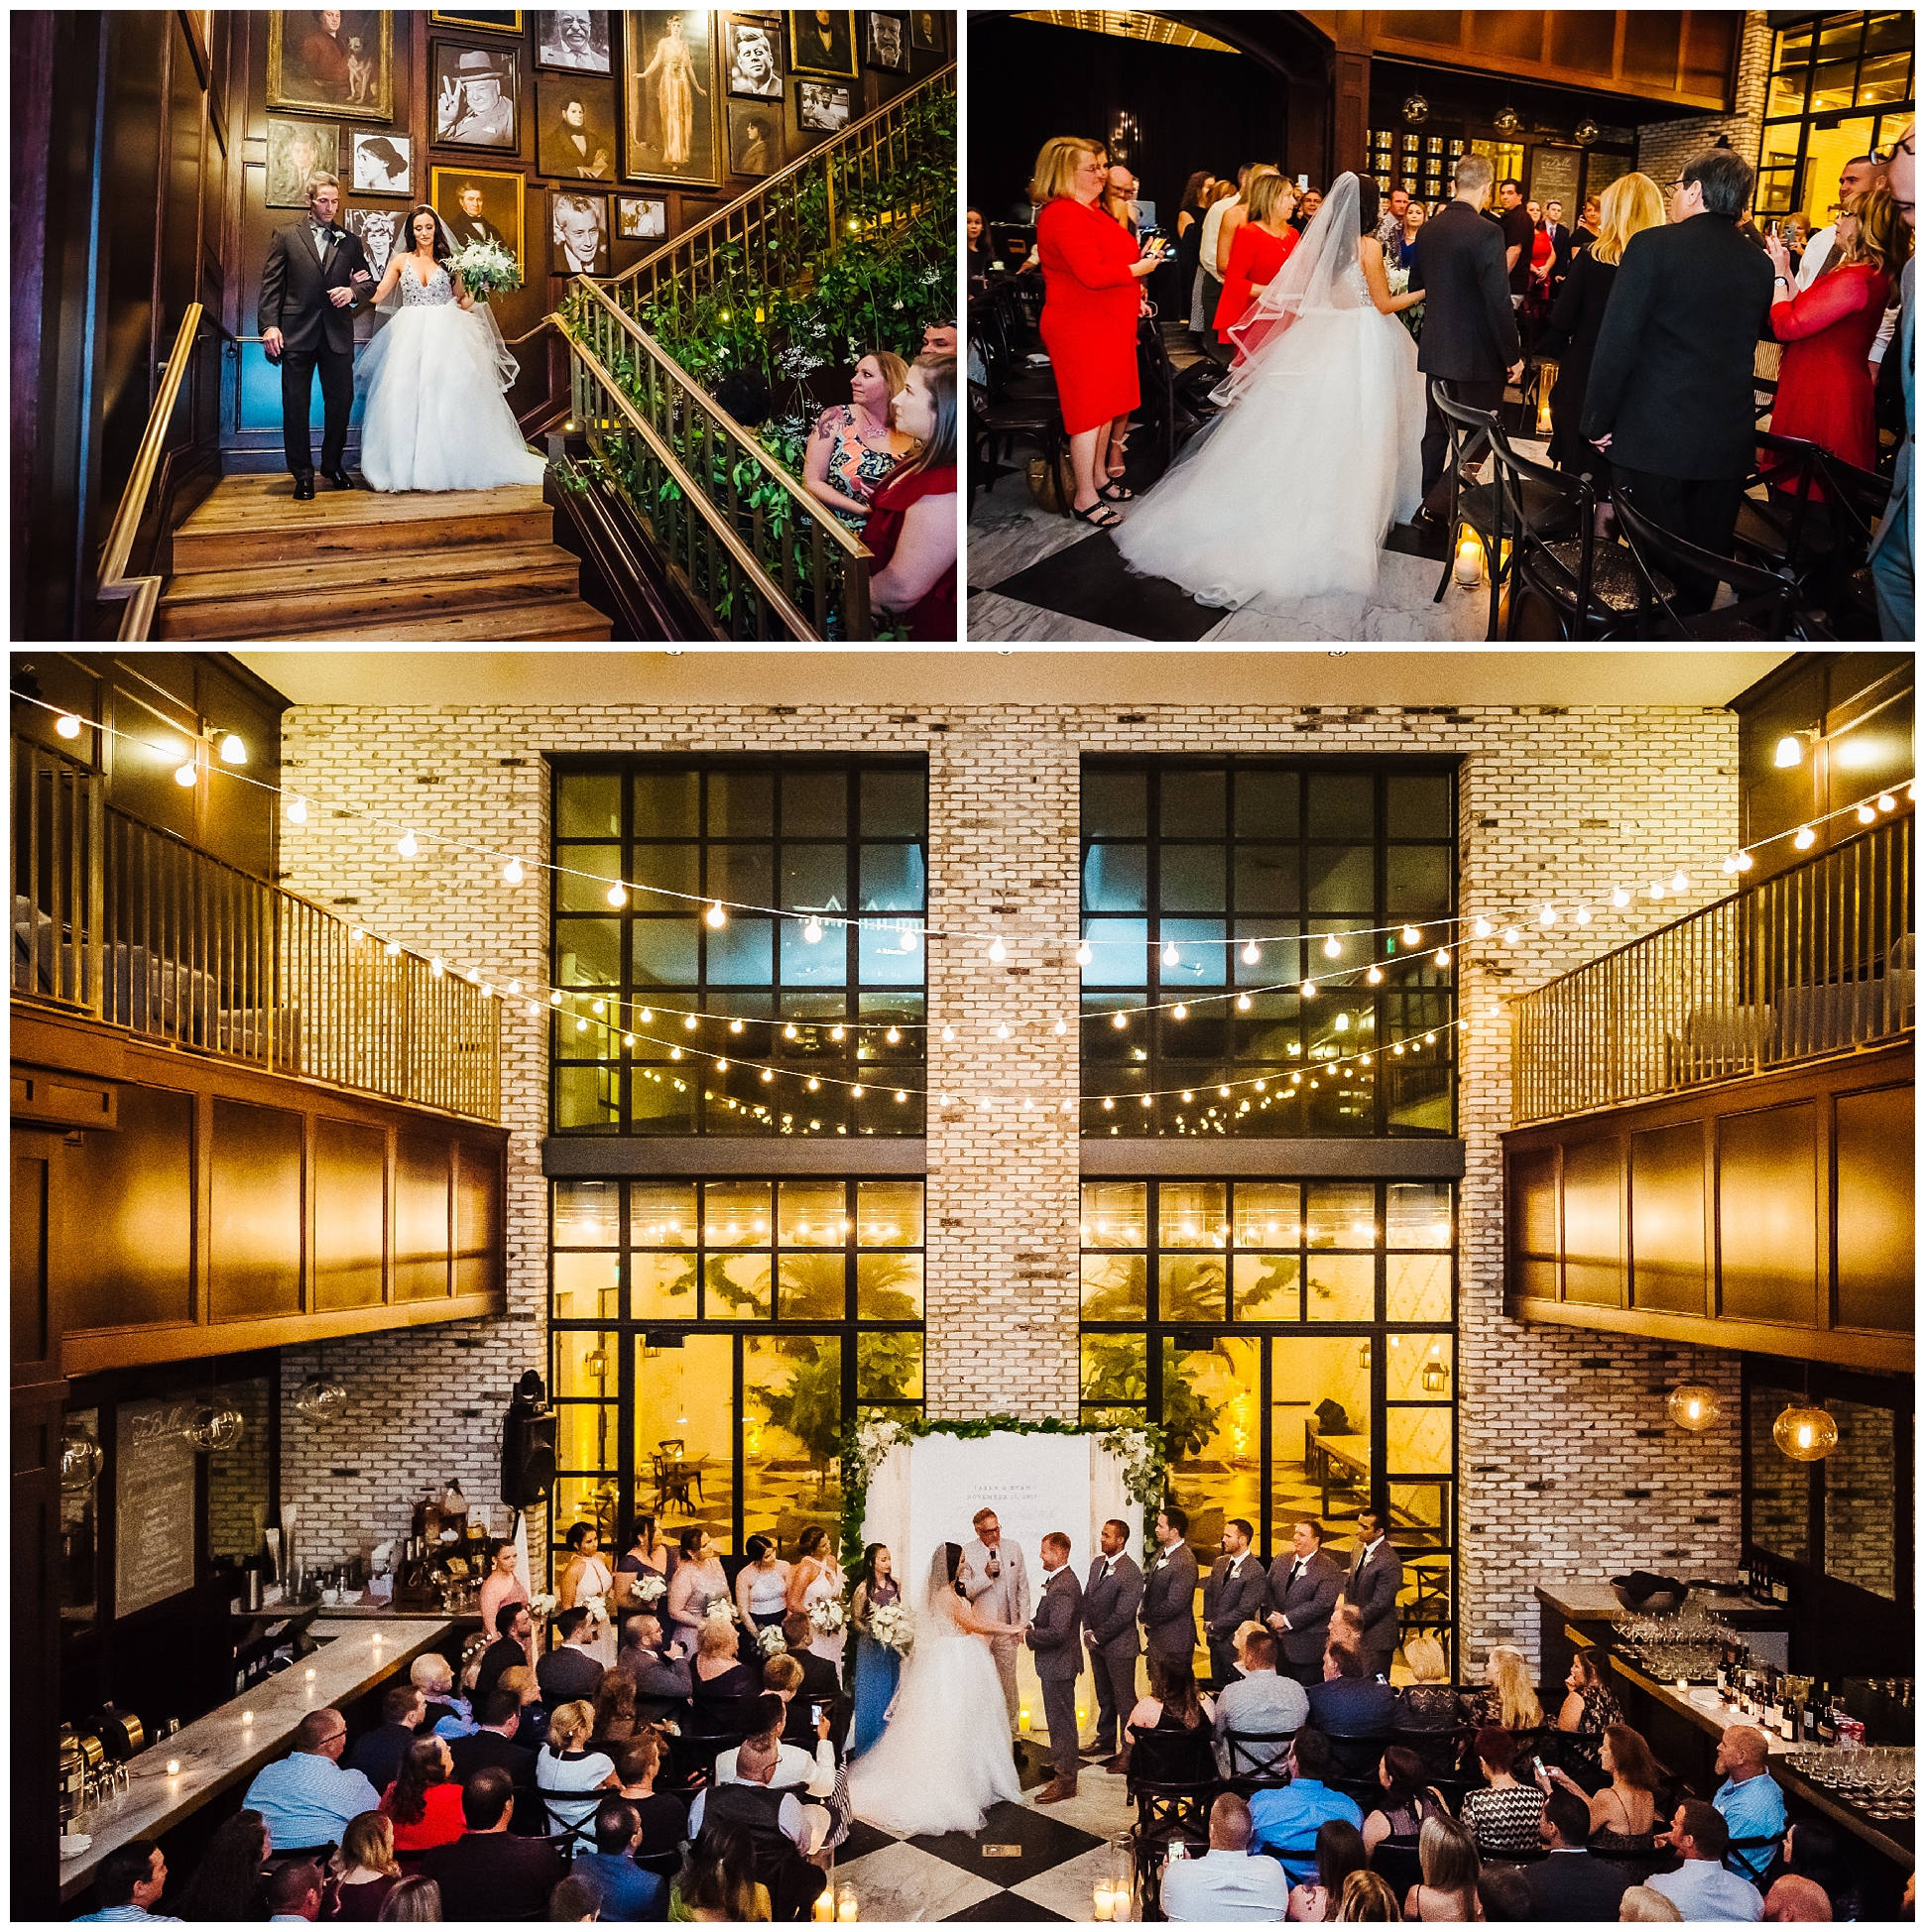 tampa-wedding-photographer-oxford-exchange-garland-candlelight-gold-hayley-paige_0045.jpg